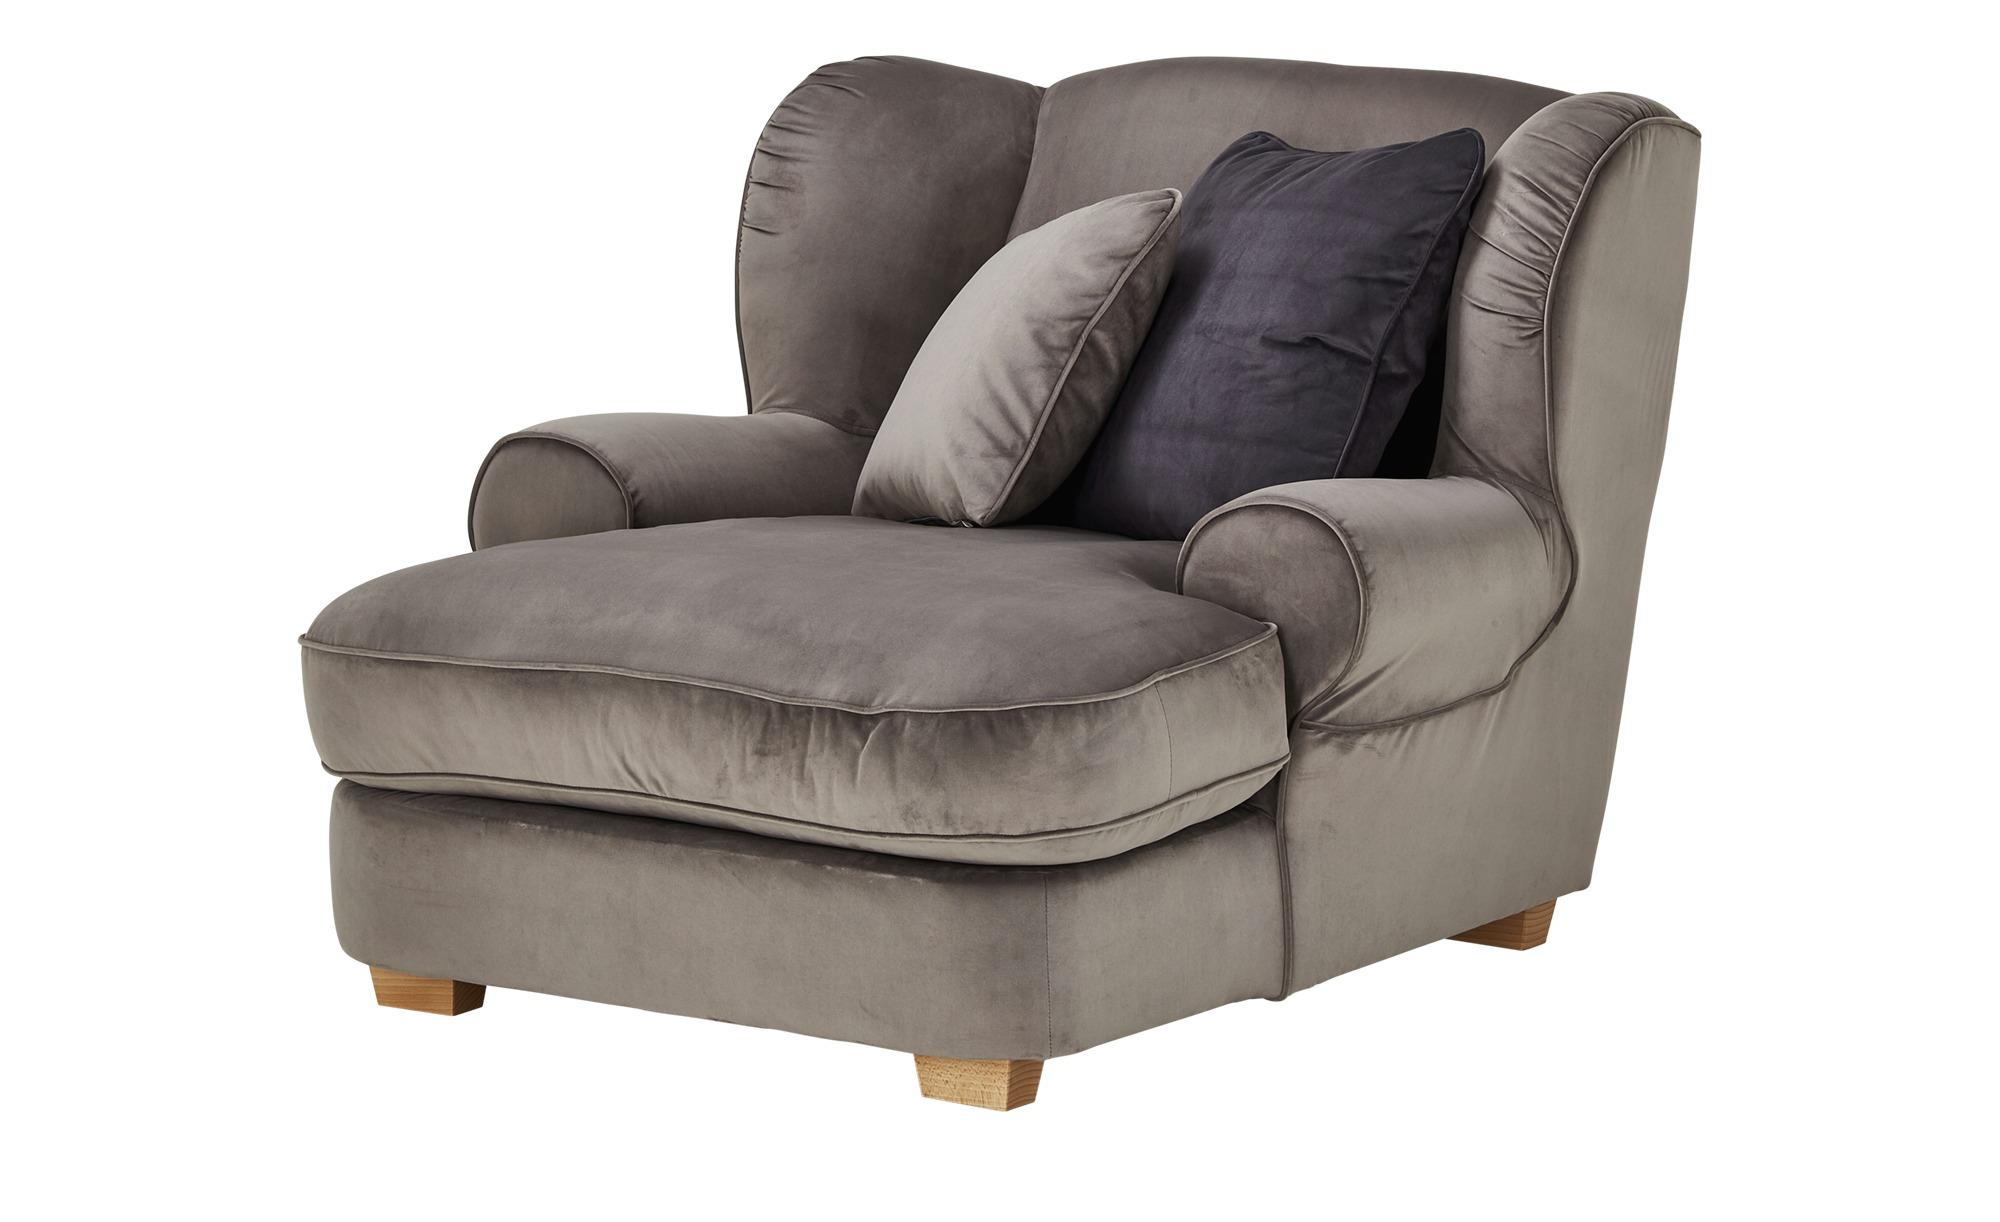 Megasessel  Lounge ¦ Maße (cm): B: 122 H: 97 T: 140 Polstermöbel > Sessel > Ohrensessel - Höffner